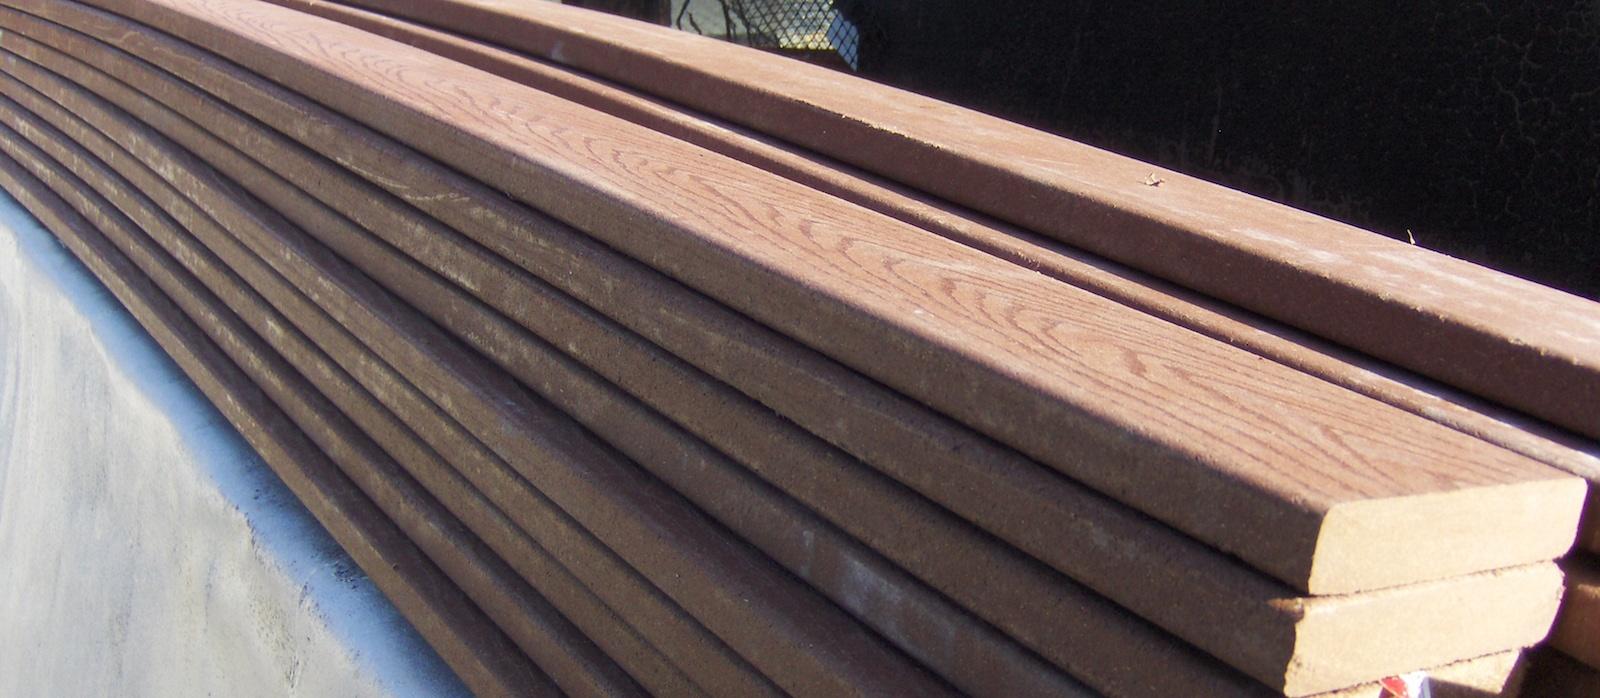 trex composite decking vs permatrak concrete boardwalk. Black Bedroom Furniture Sets. Home Design Ideas